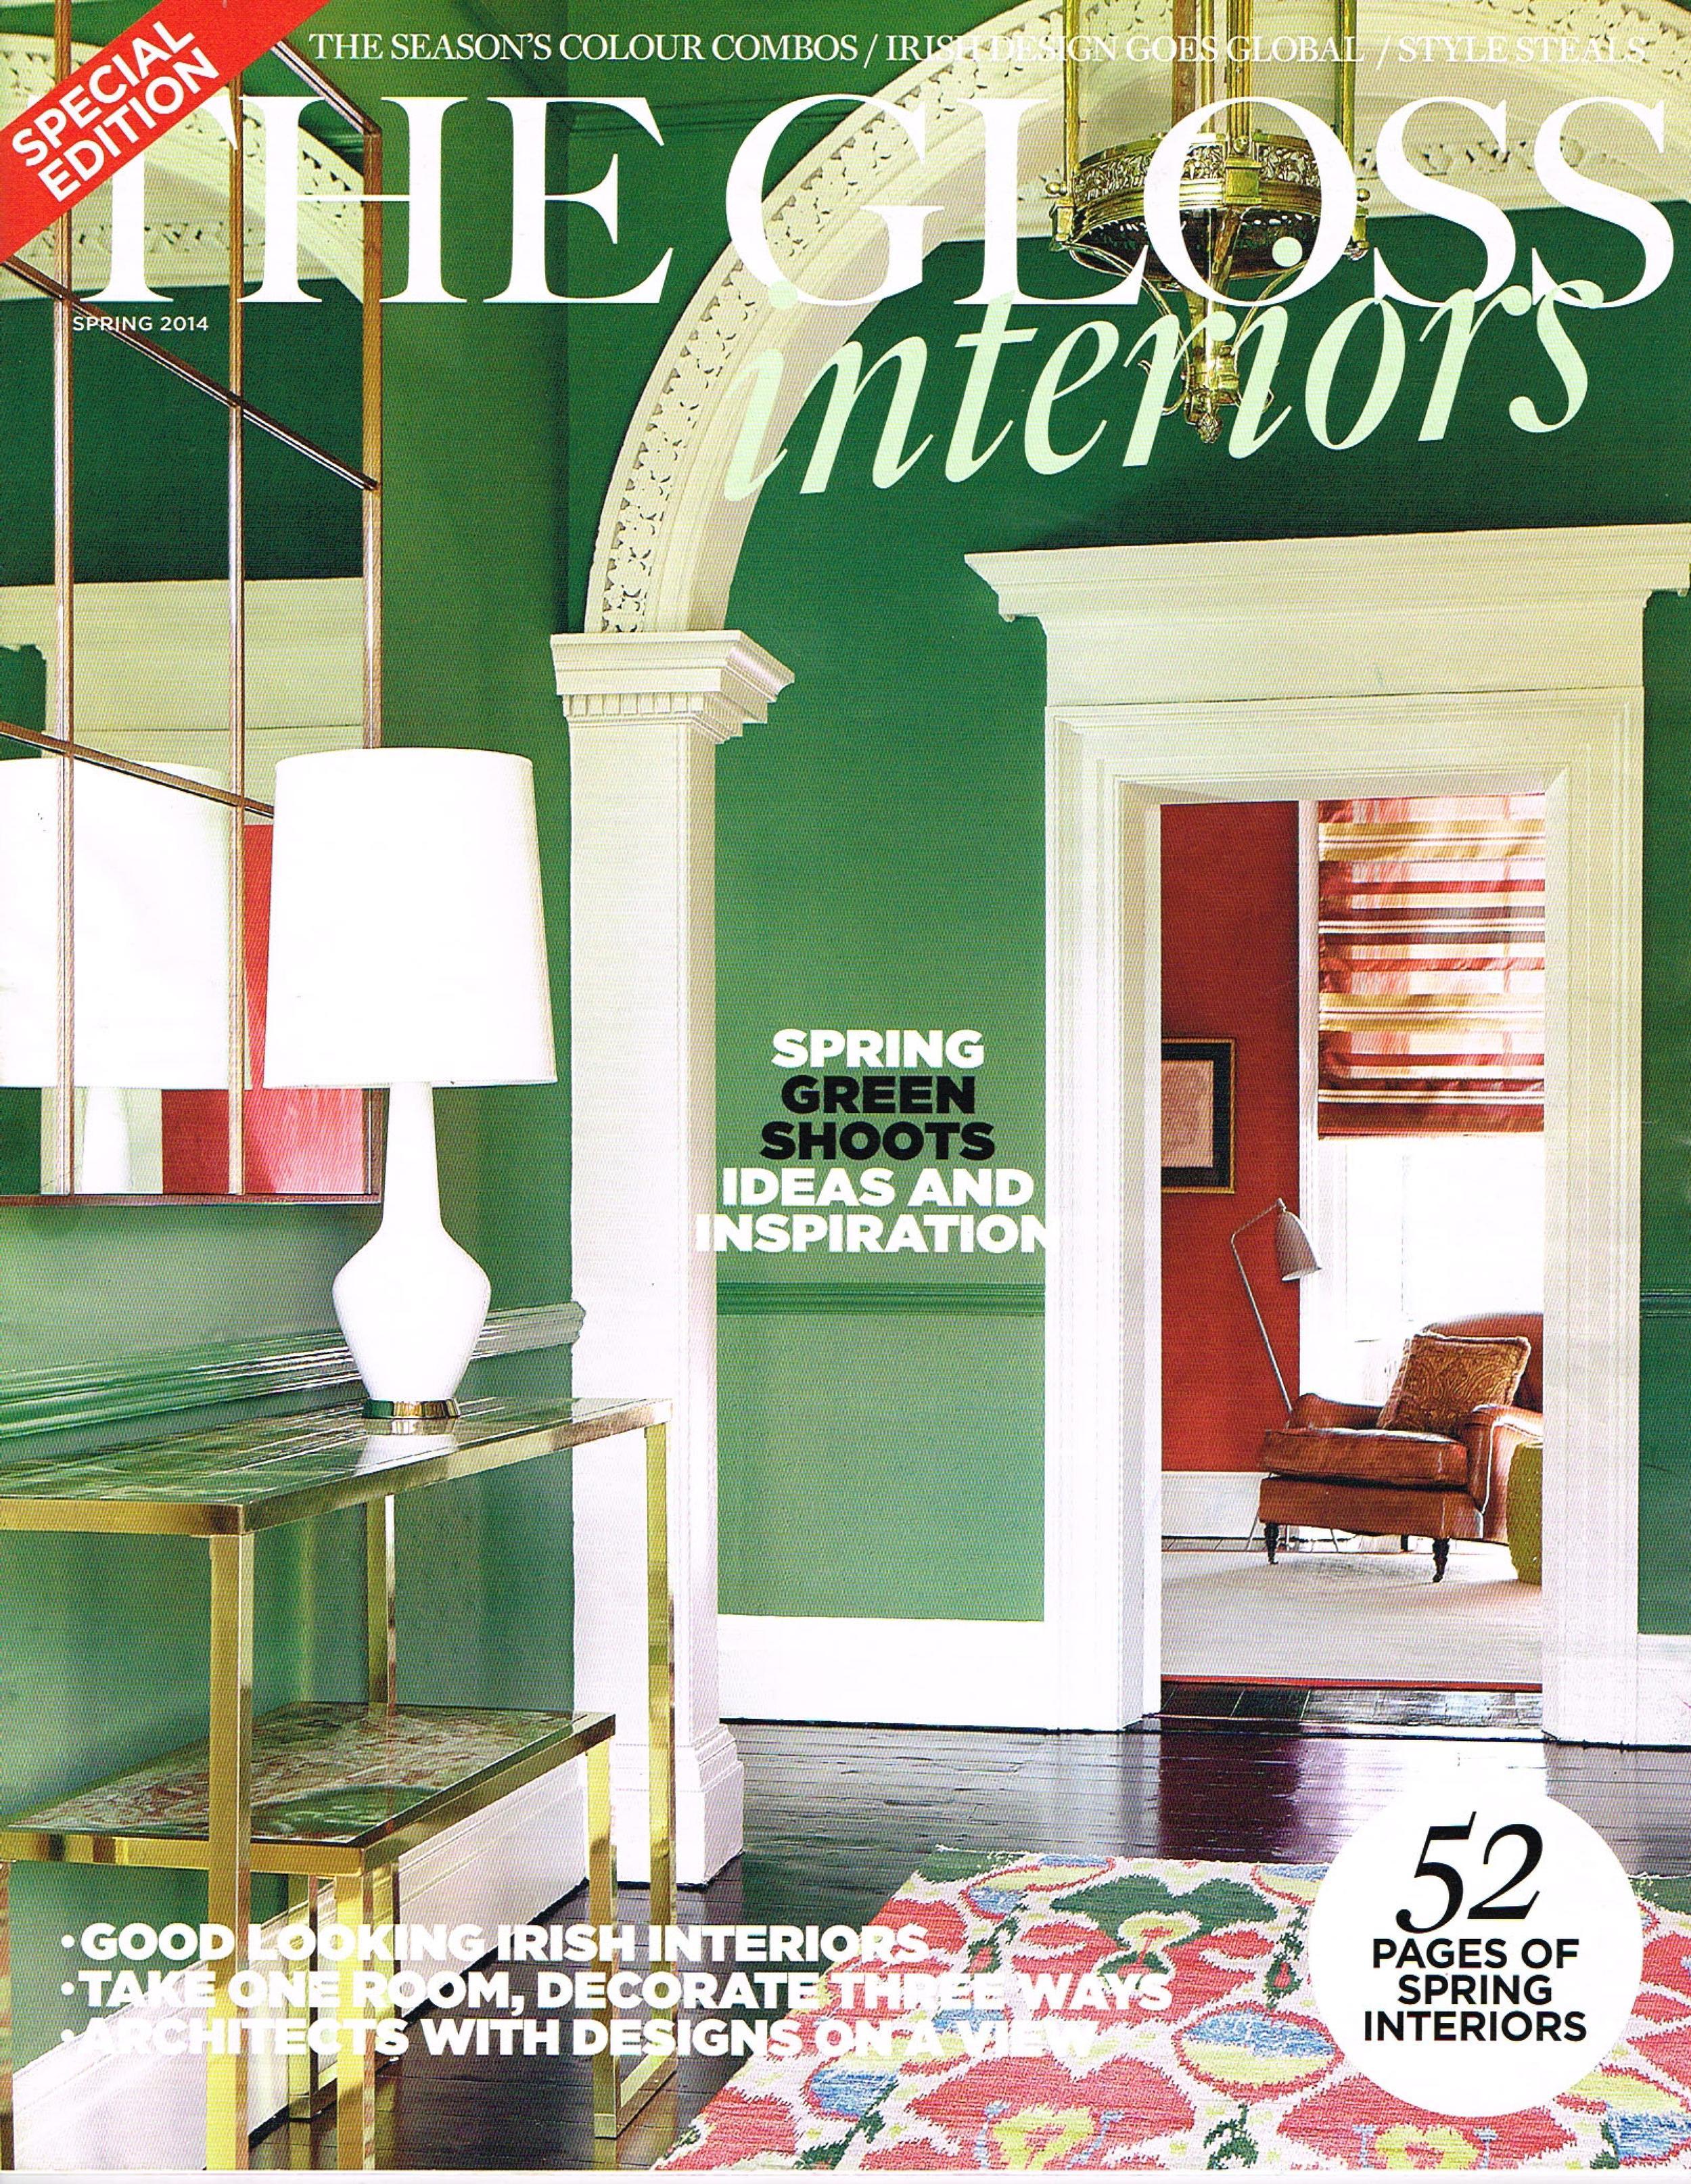 Gloss Interiors  Magazine Feature14052014-page1.jpg